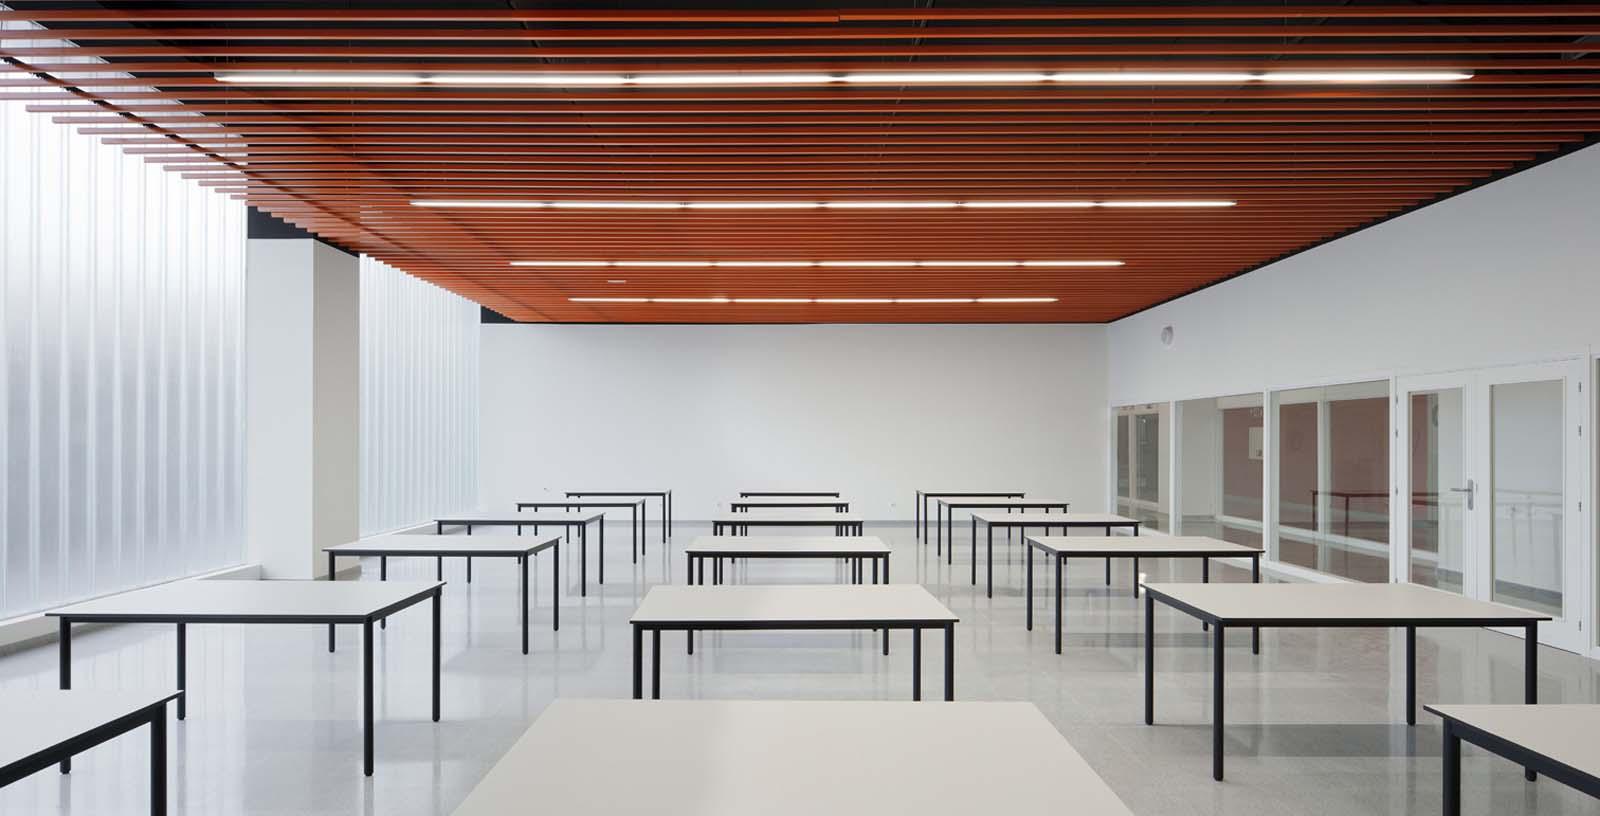 Engineerings_Schools_Building_Bilbao_04_Architecture_IDOM_photos_Aitor_Ortiz